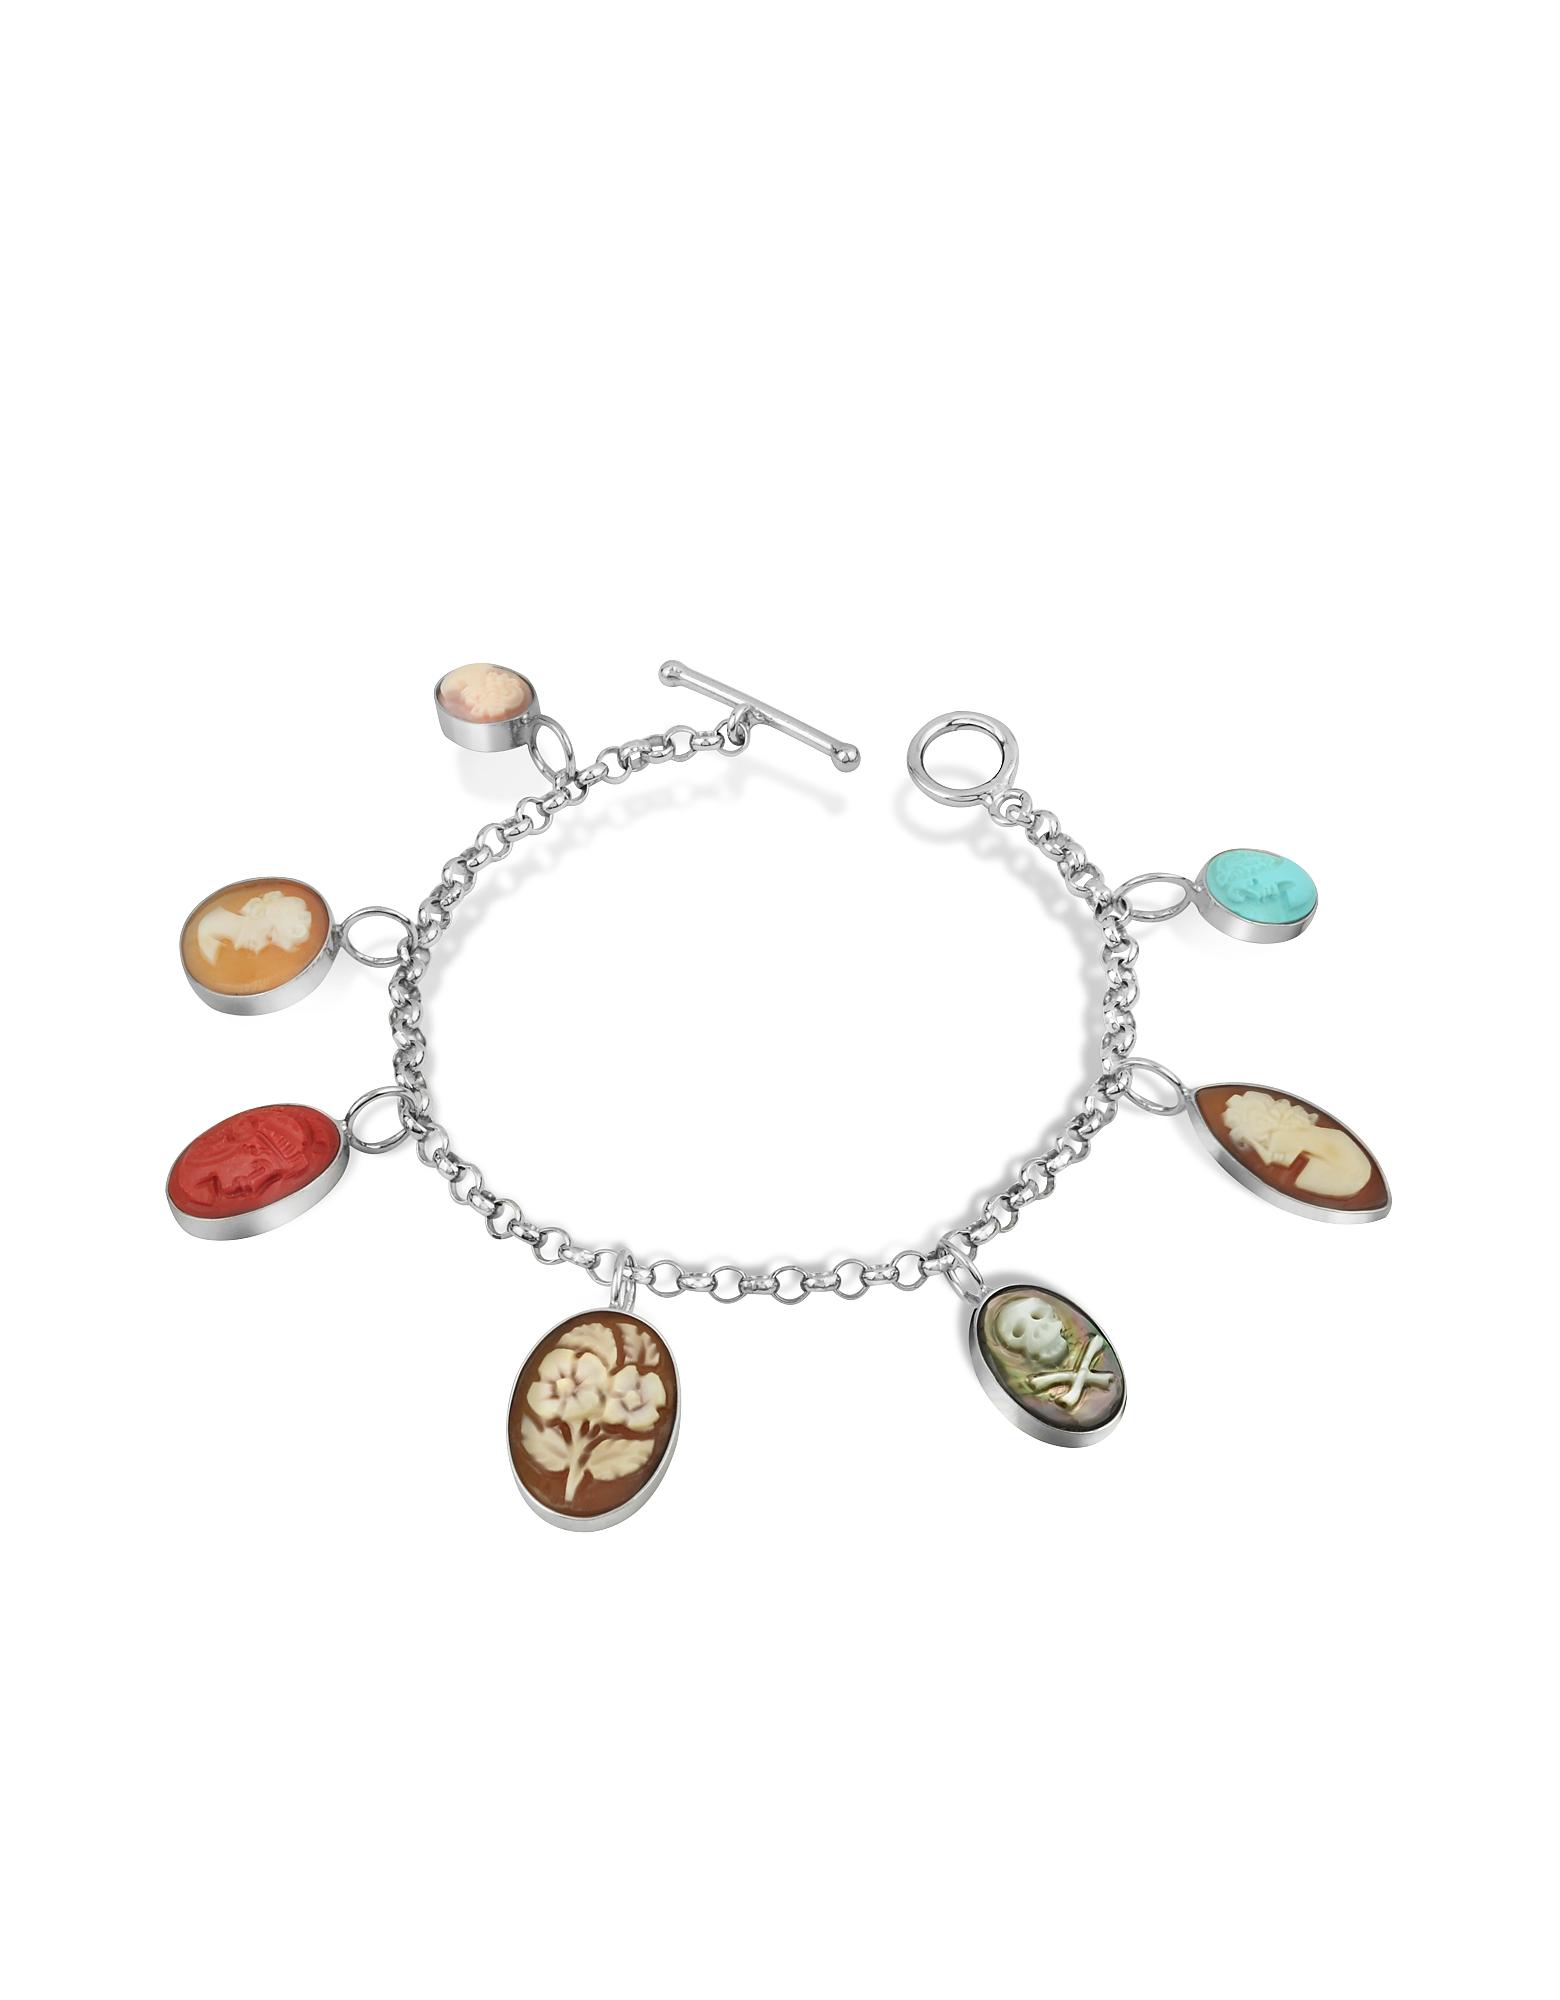 Mia & Beverly Designer Bracelets, Cameo Charm Bracelet